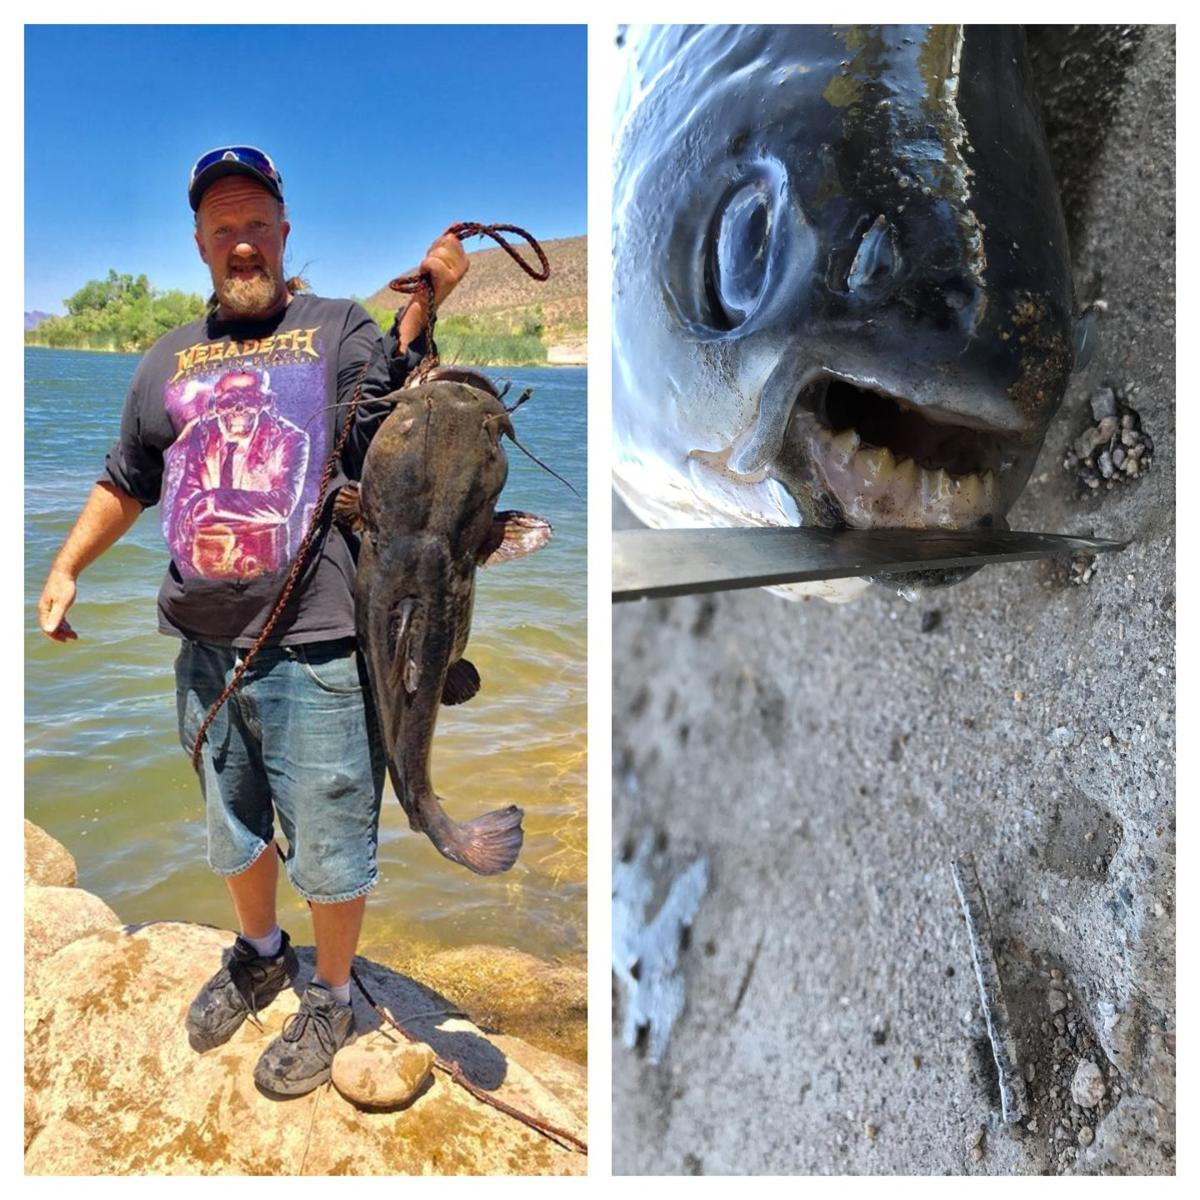 unusual fish found in Arizona